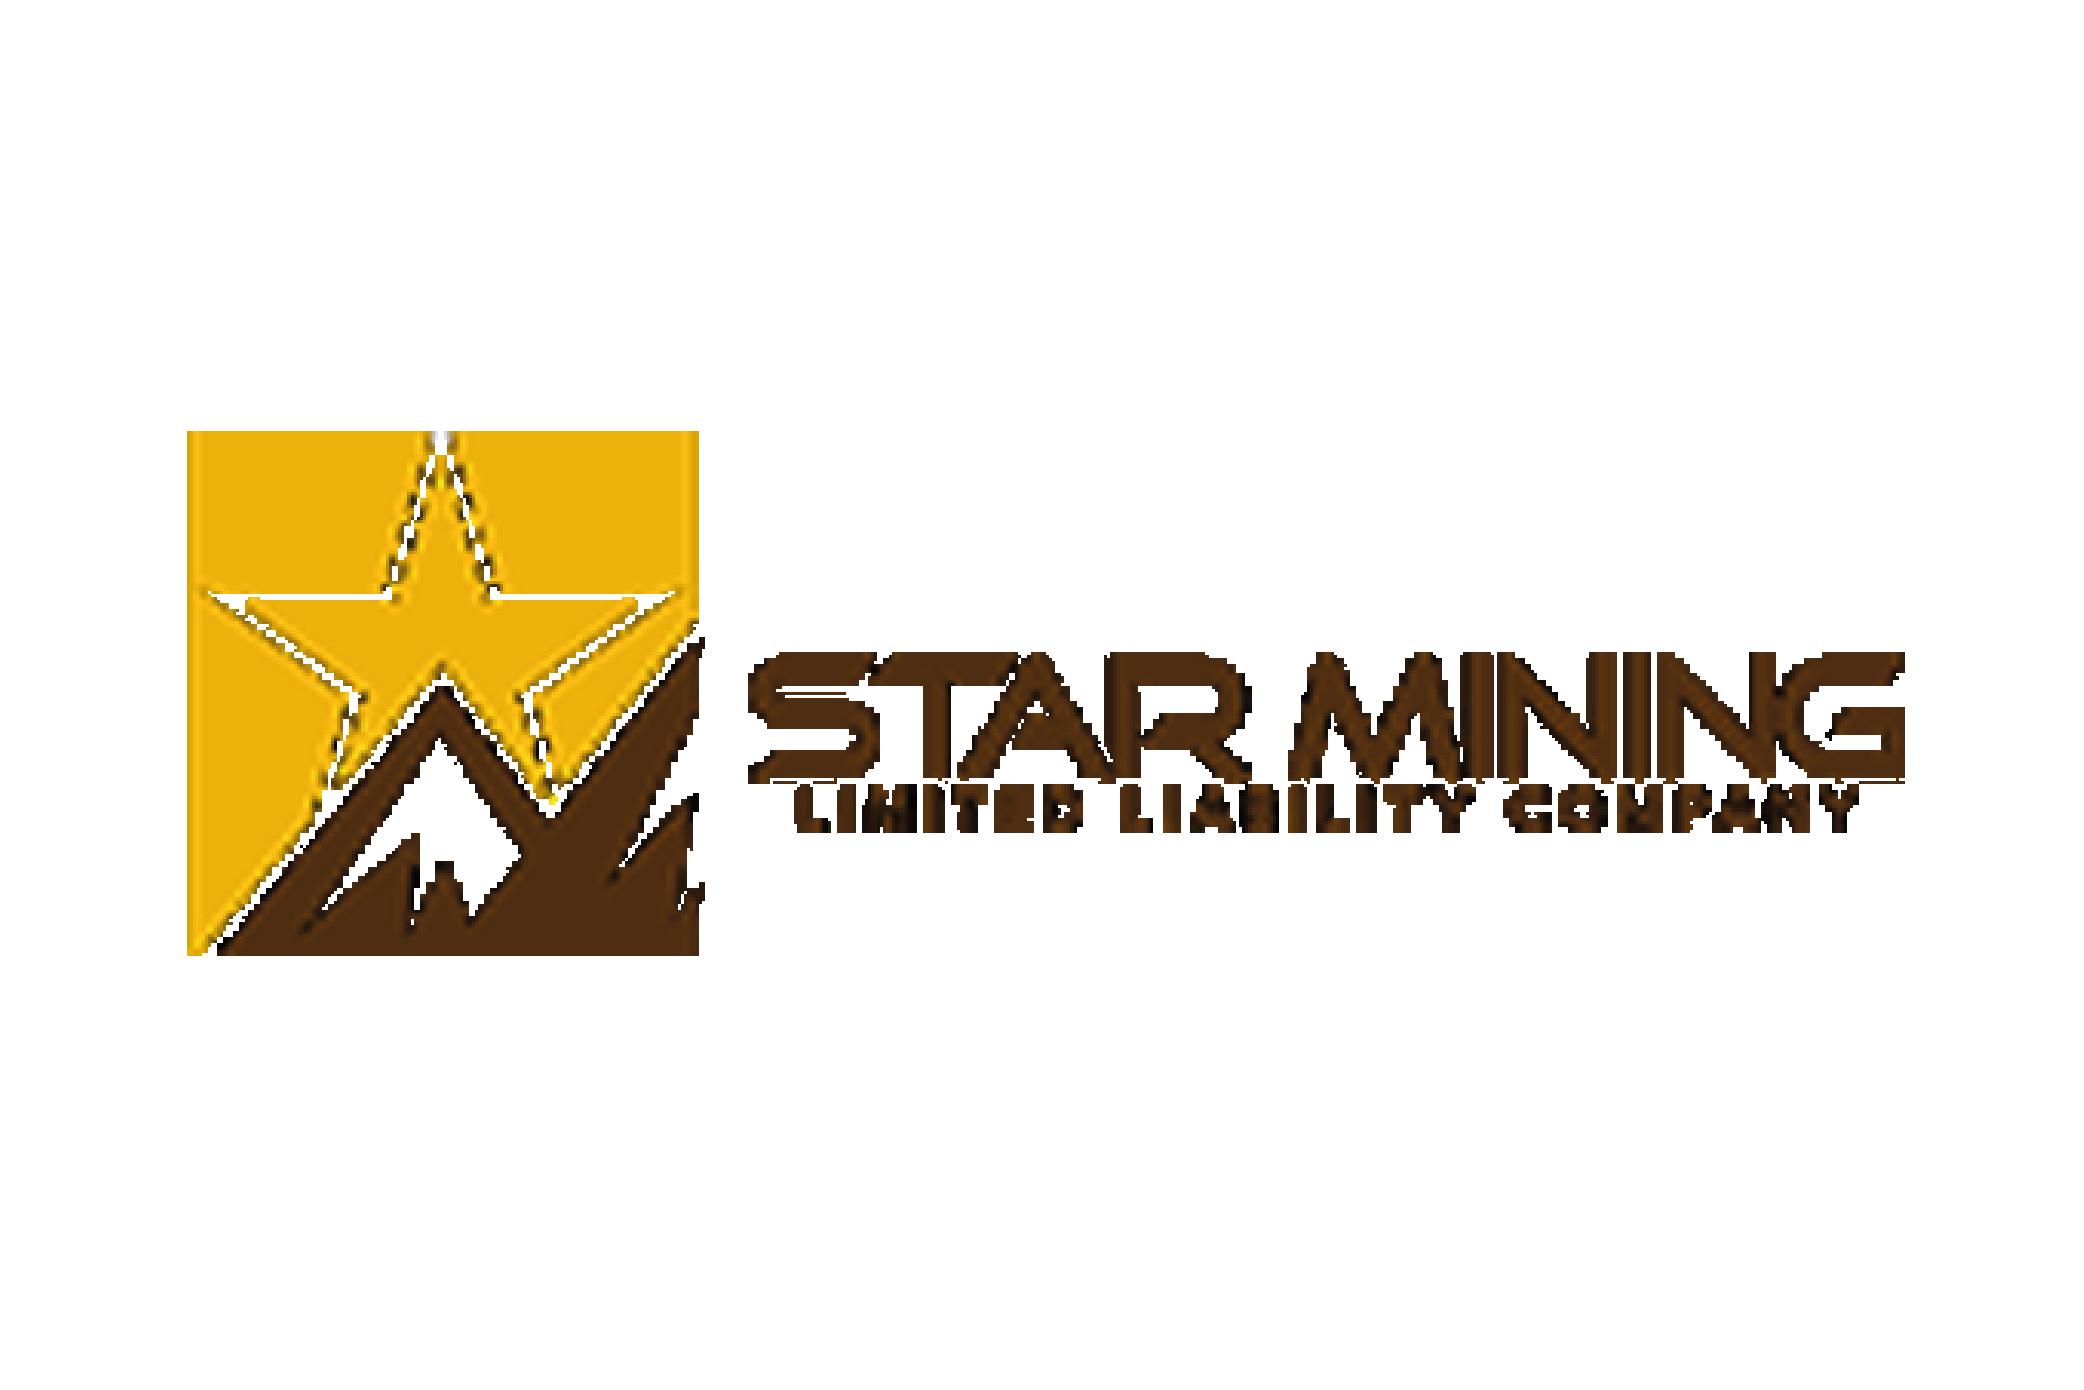 Star mining